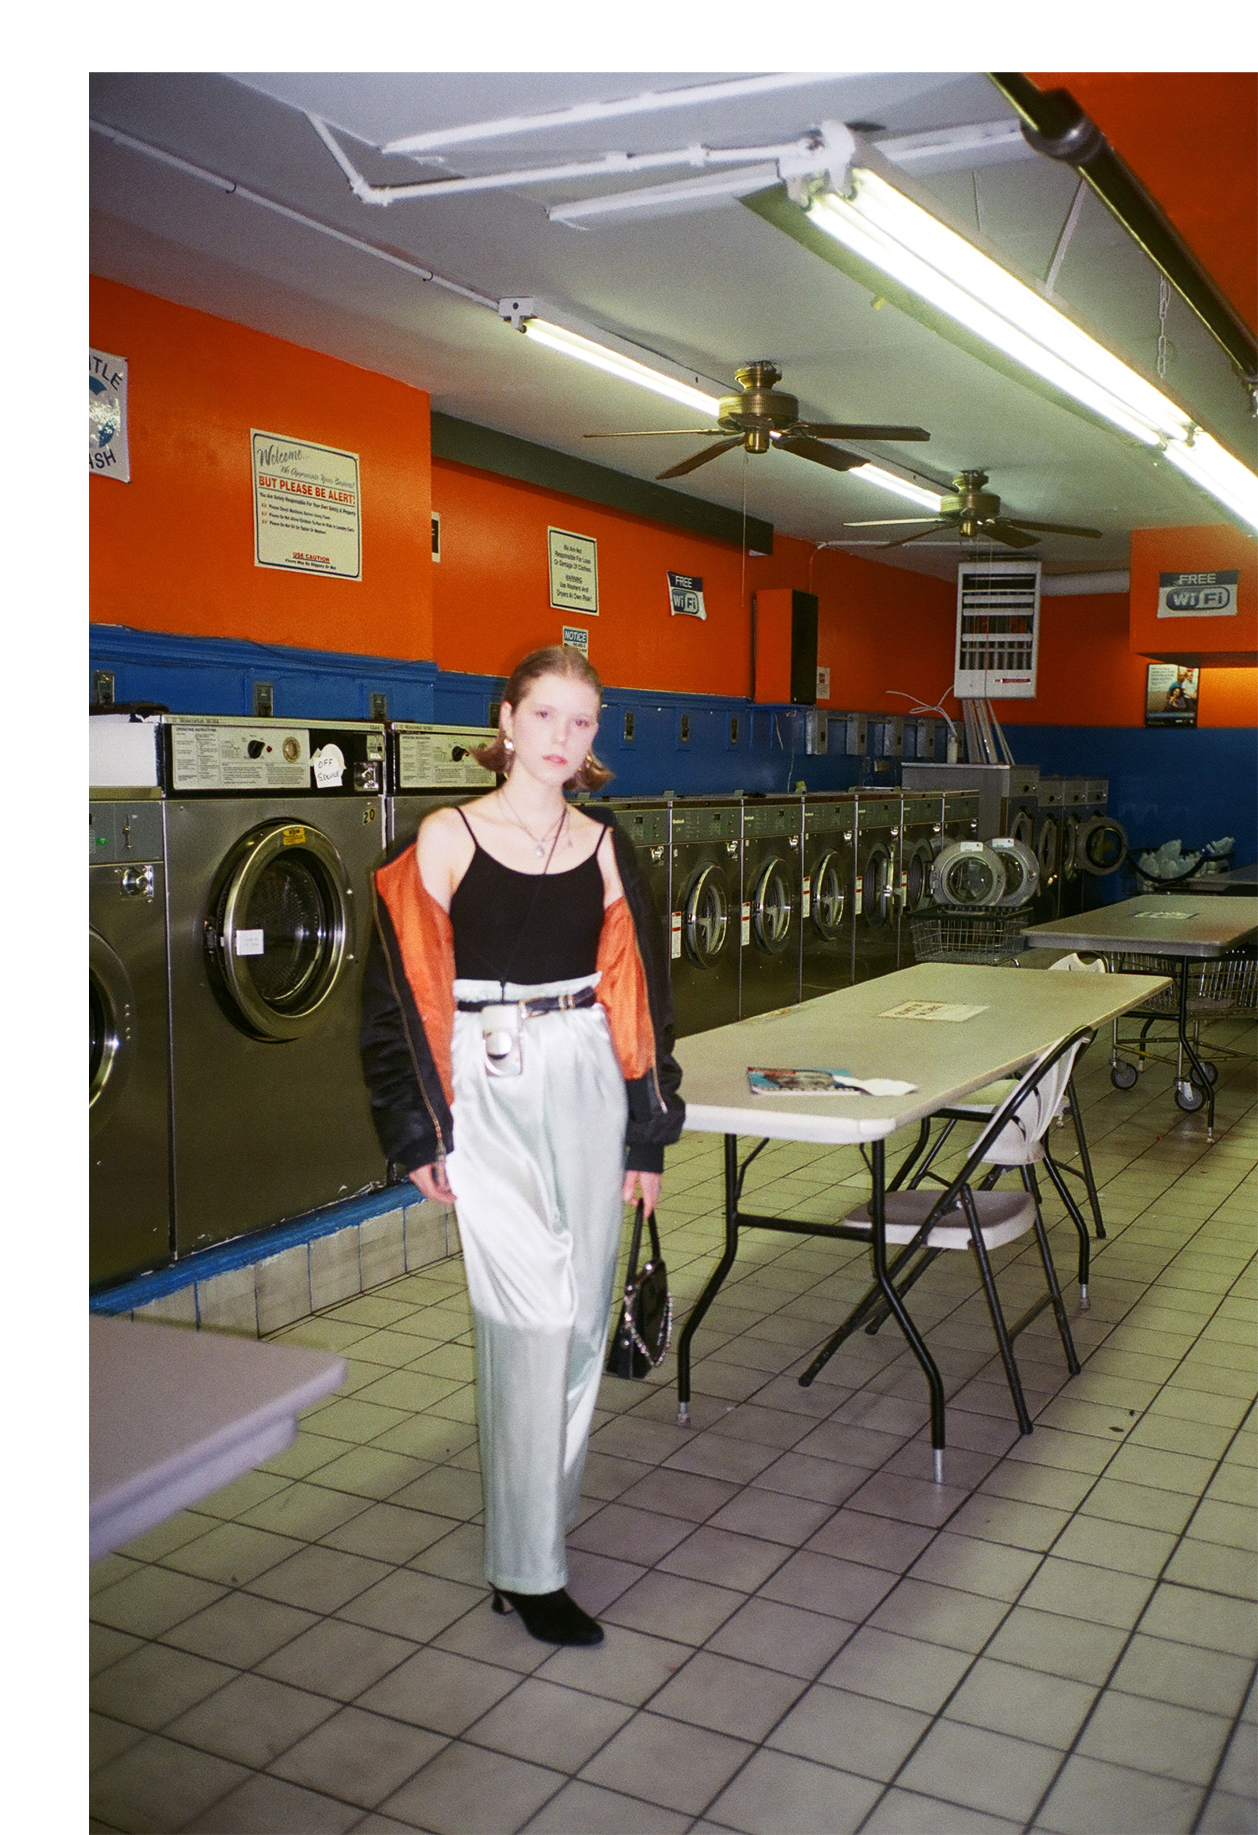 laundrymat3.jpg